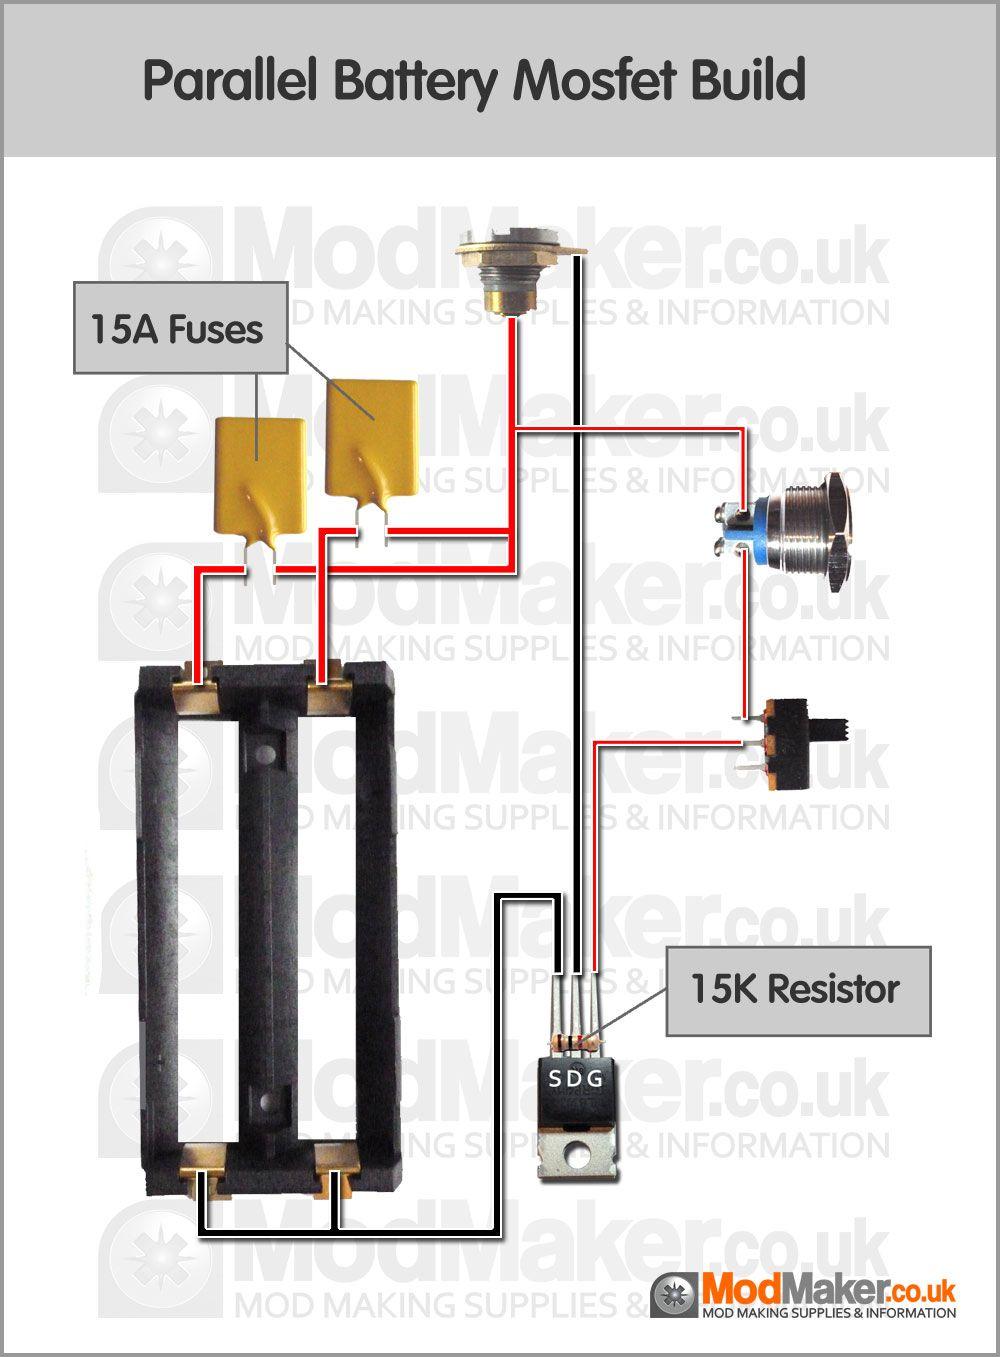 Parallel Battery Mosfet Wiring Diagram Diy box mod, Vape